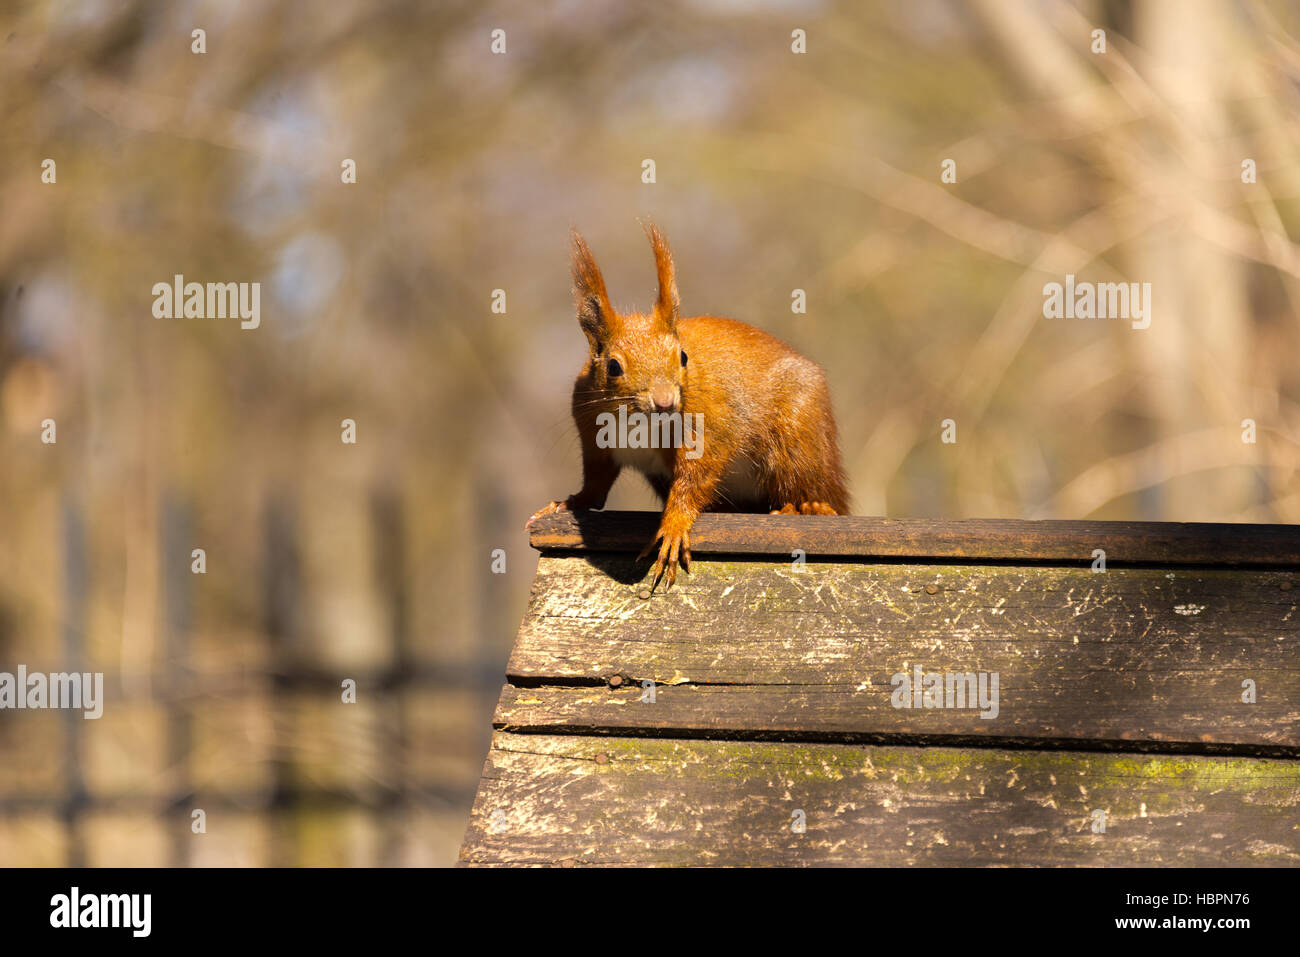 Sqirrel en parc, Berlin, Allemagne Photo Stock